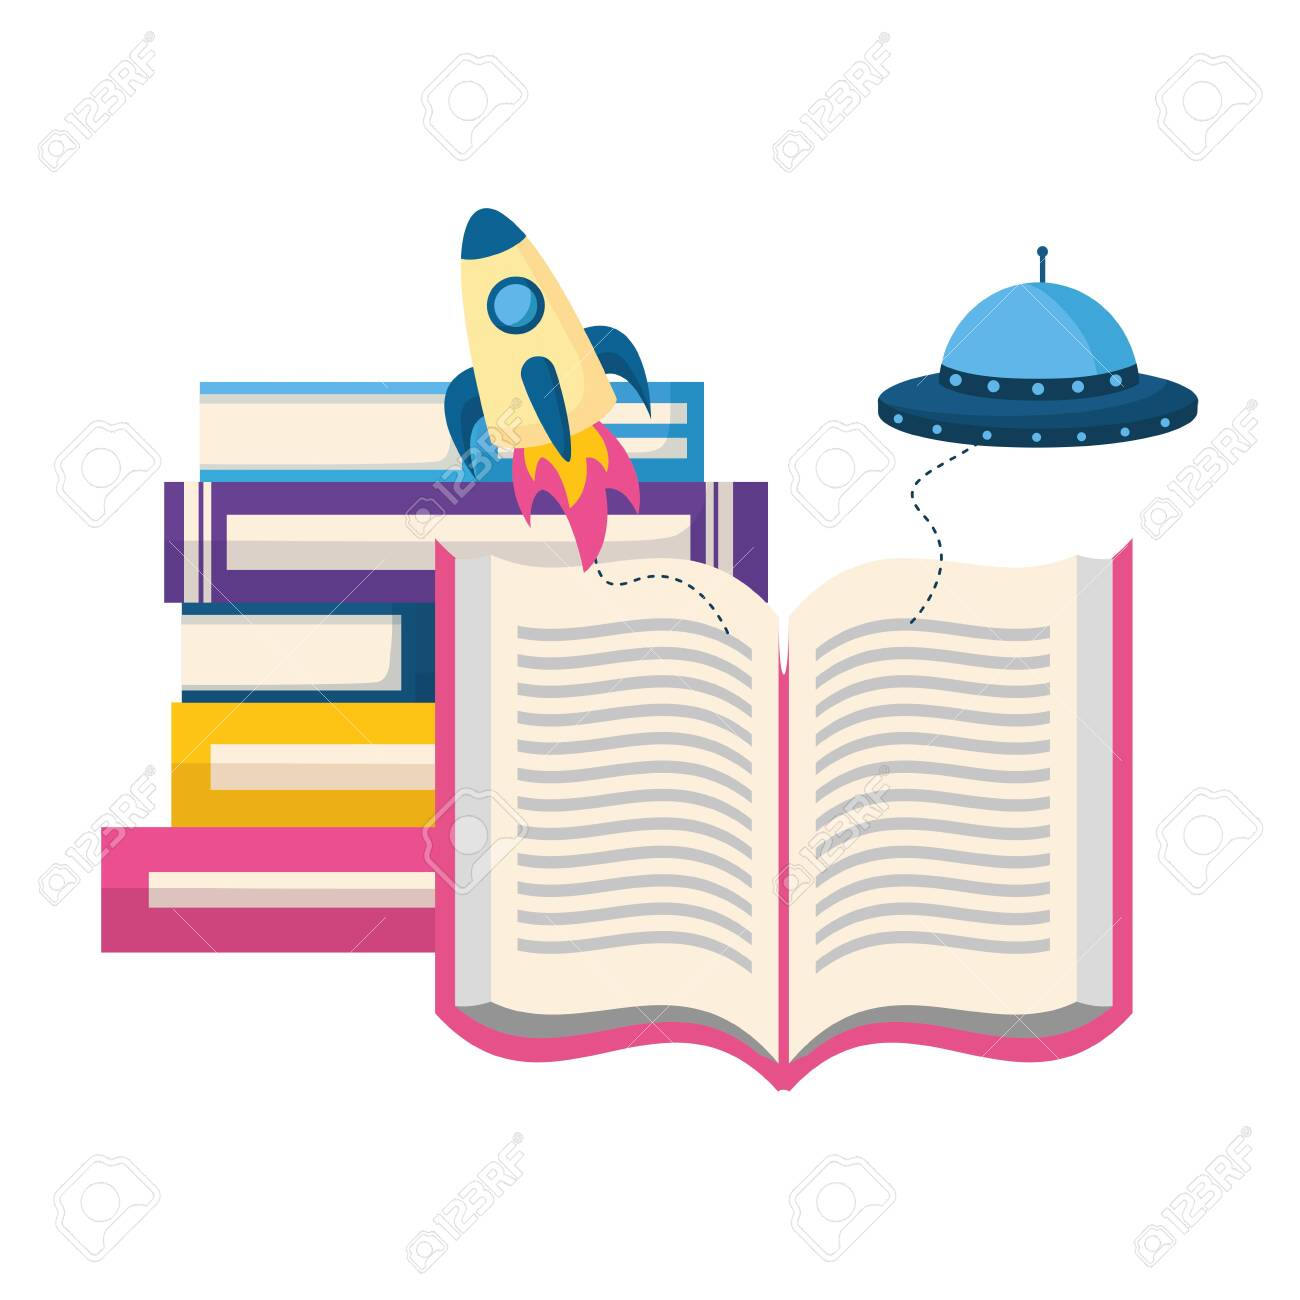 world book day fantasy fiction travel vector illustration - 124334750